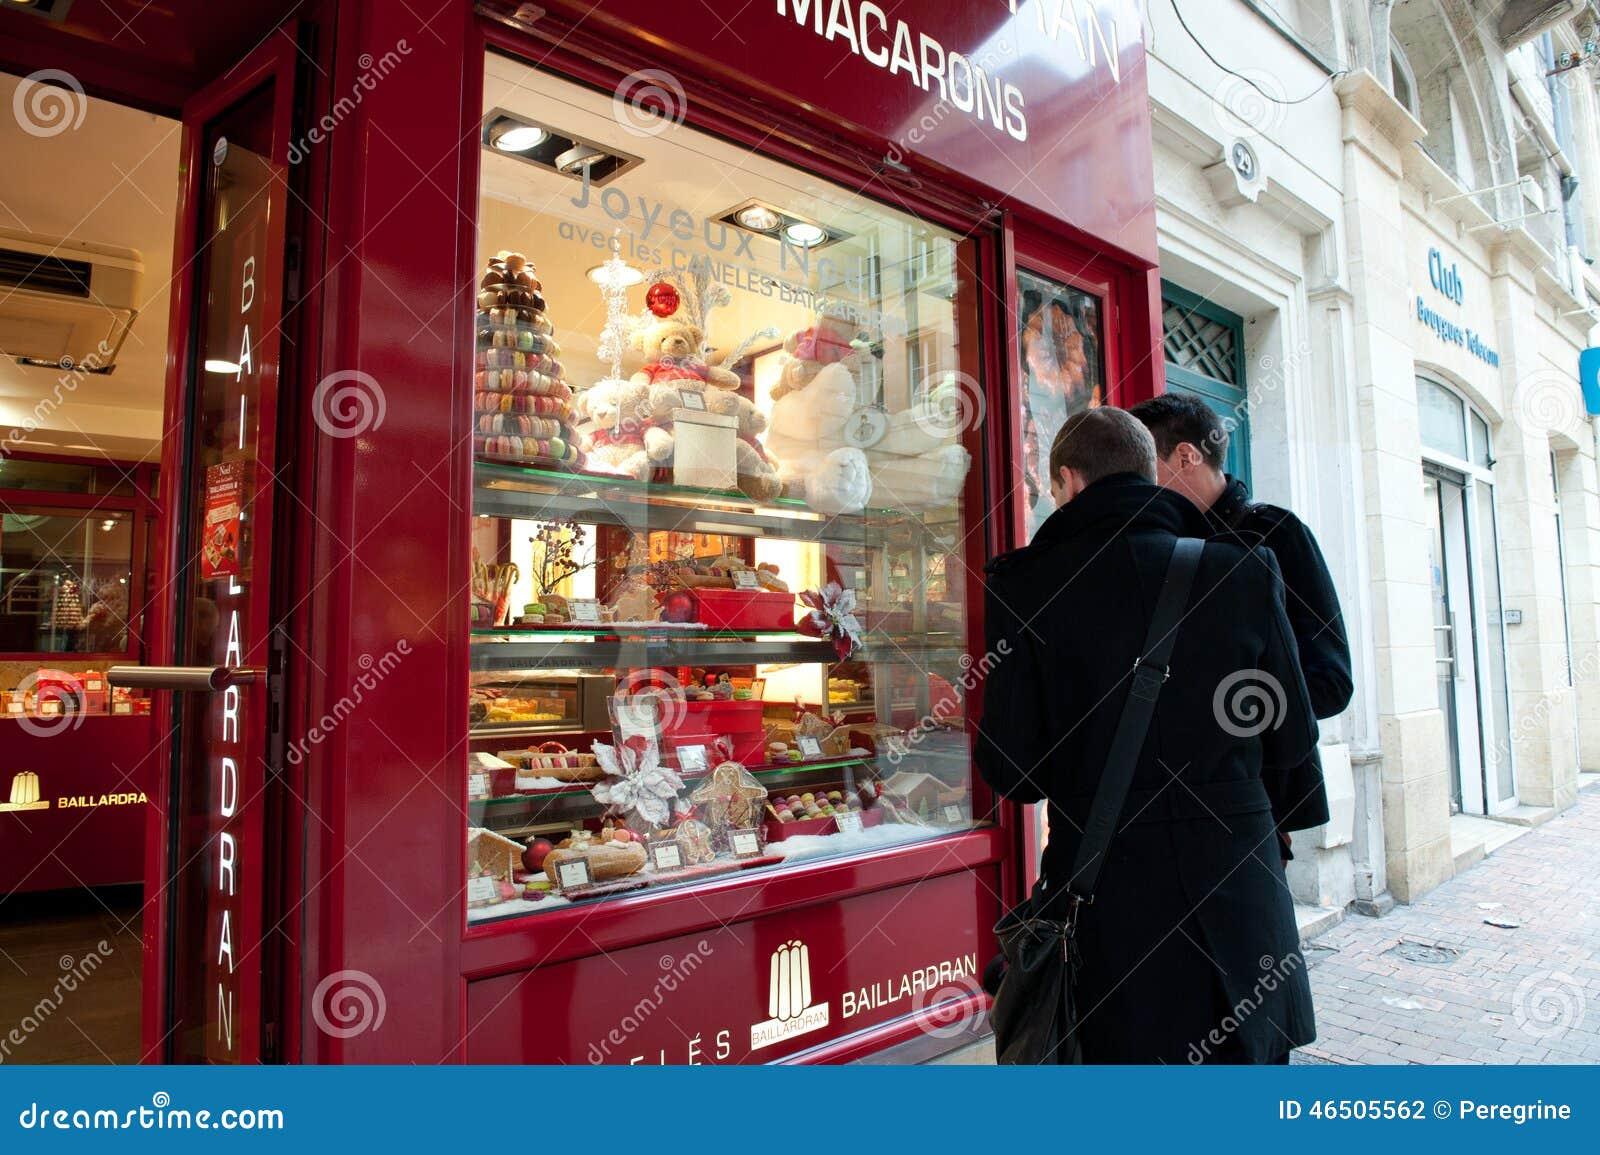 Nice Shop Baillardran Bordeaux France Editorial Photography Image